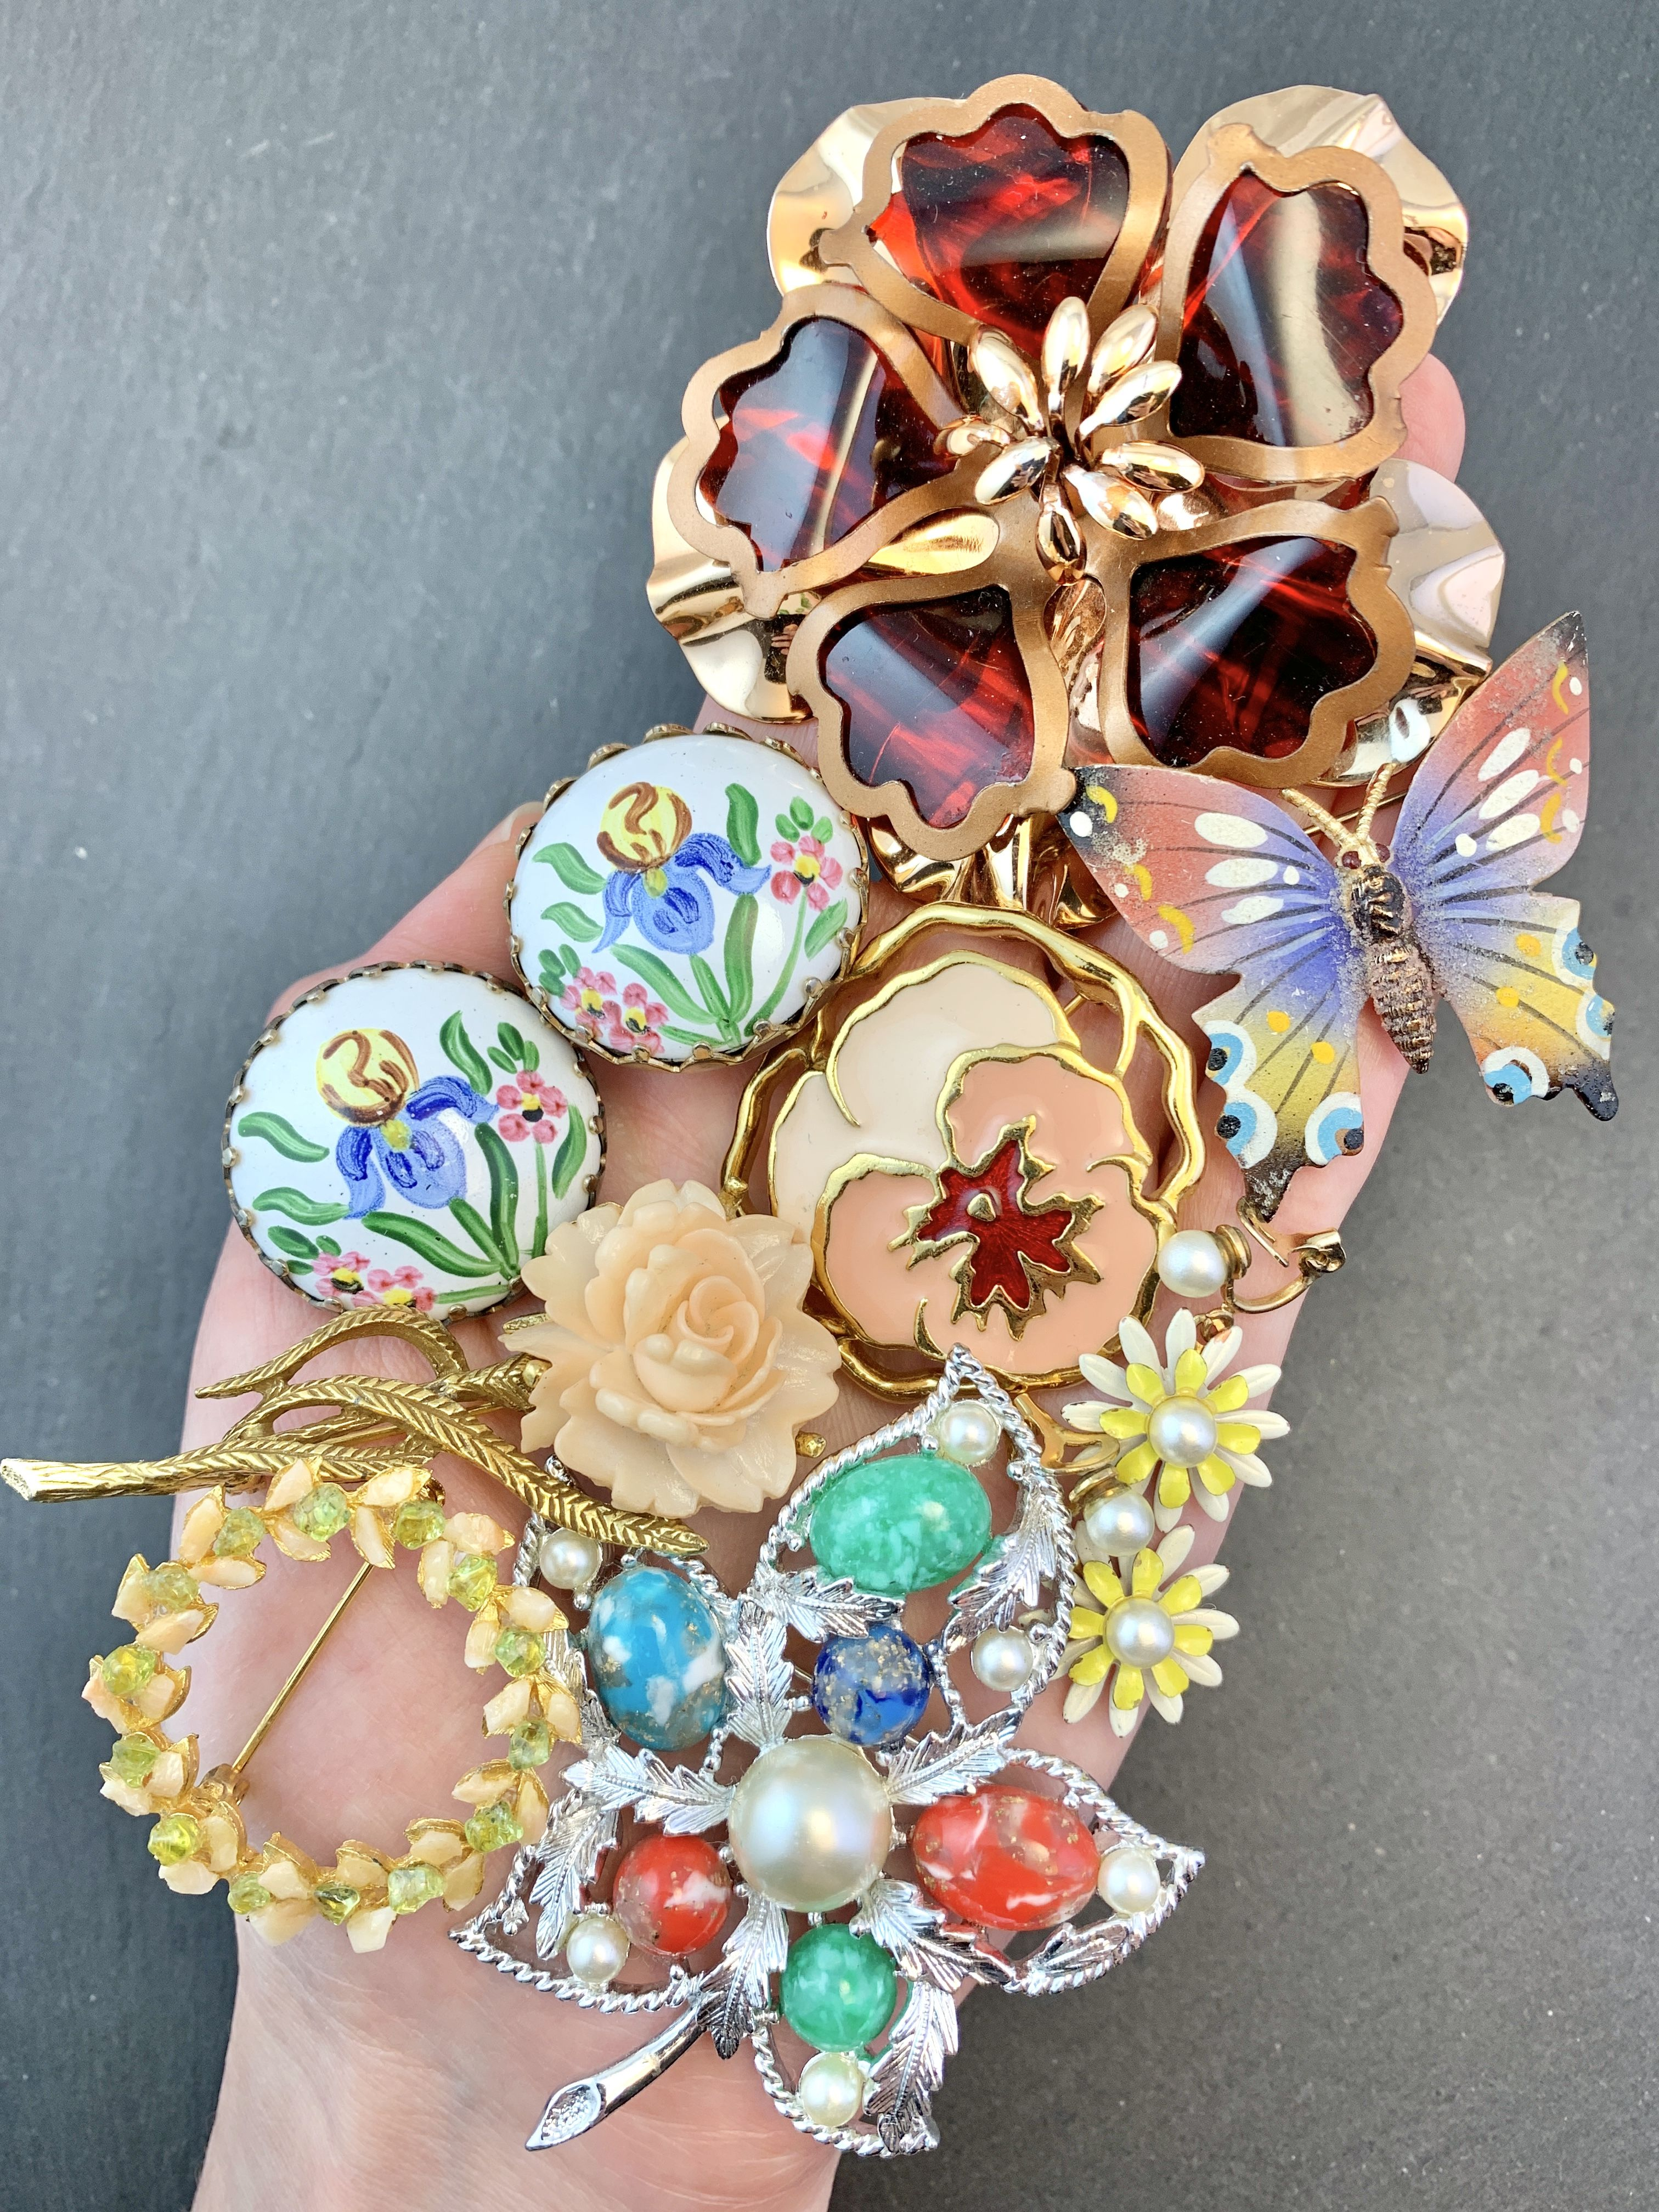 Follow me on Instagram @eVintique or visit my eBay shop evintique.com💕 vintage jewelry, vintage accessories, vintage fashion, spring fashion, flower jewelry, insect jewelry, summer fashion, spring style, women's jewelry, #vintagestyle #vintagefashion #vintagejewelry #brooch #pins #earrings #springstyle #springfashion #springoutfits #summerstyle #summerfashion #summervibes #womensaccessories #womensstyle